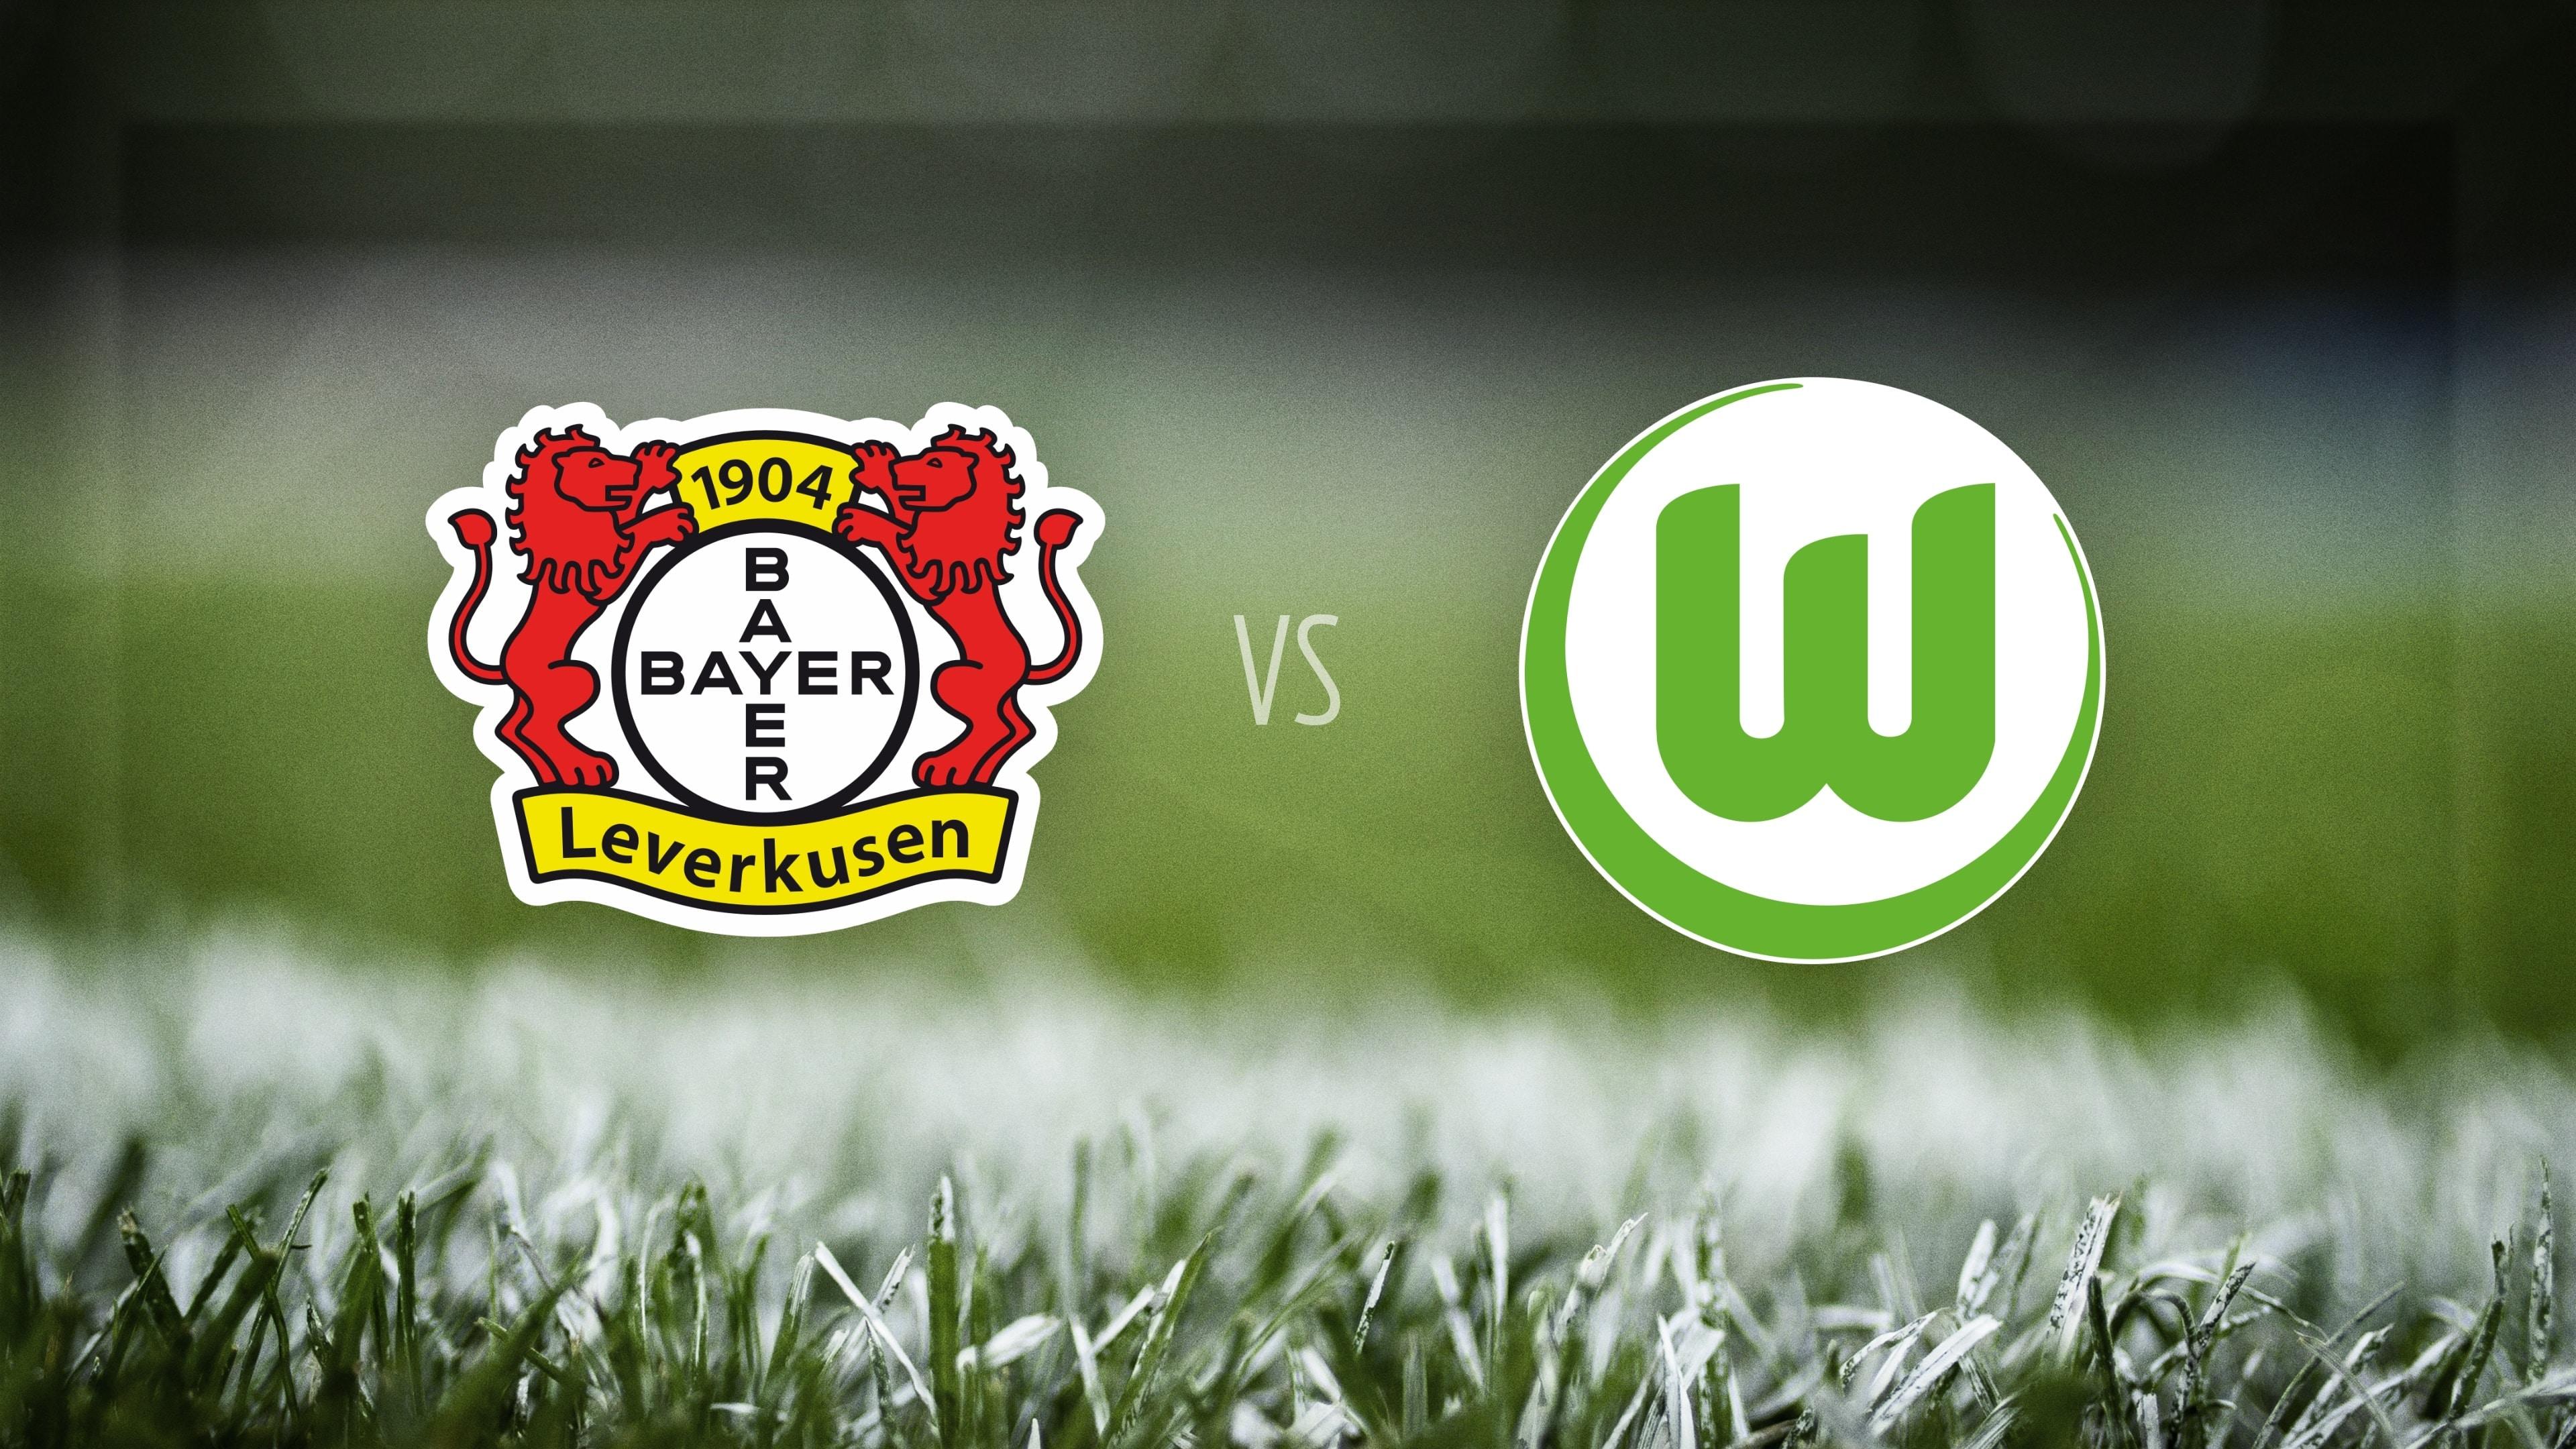 Bayer 04 Leverkusen vs. VfL Wolfsburg